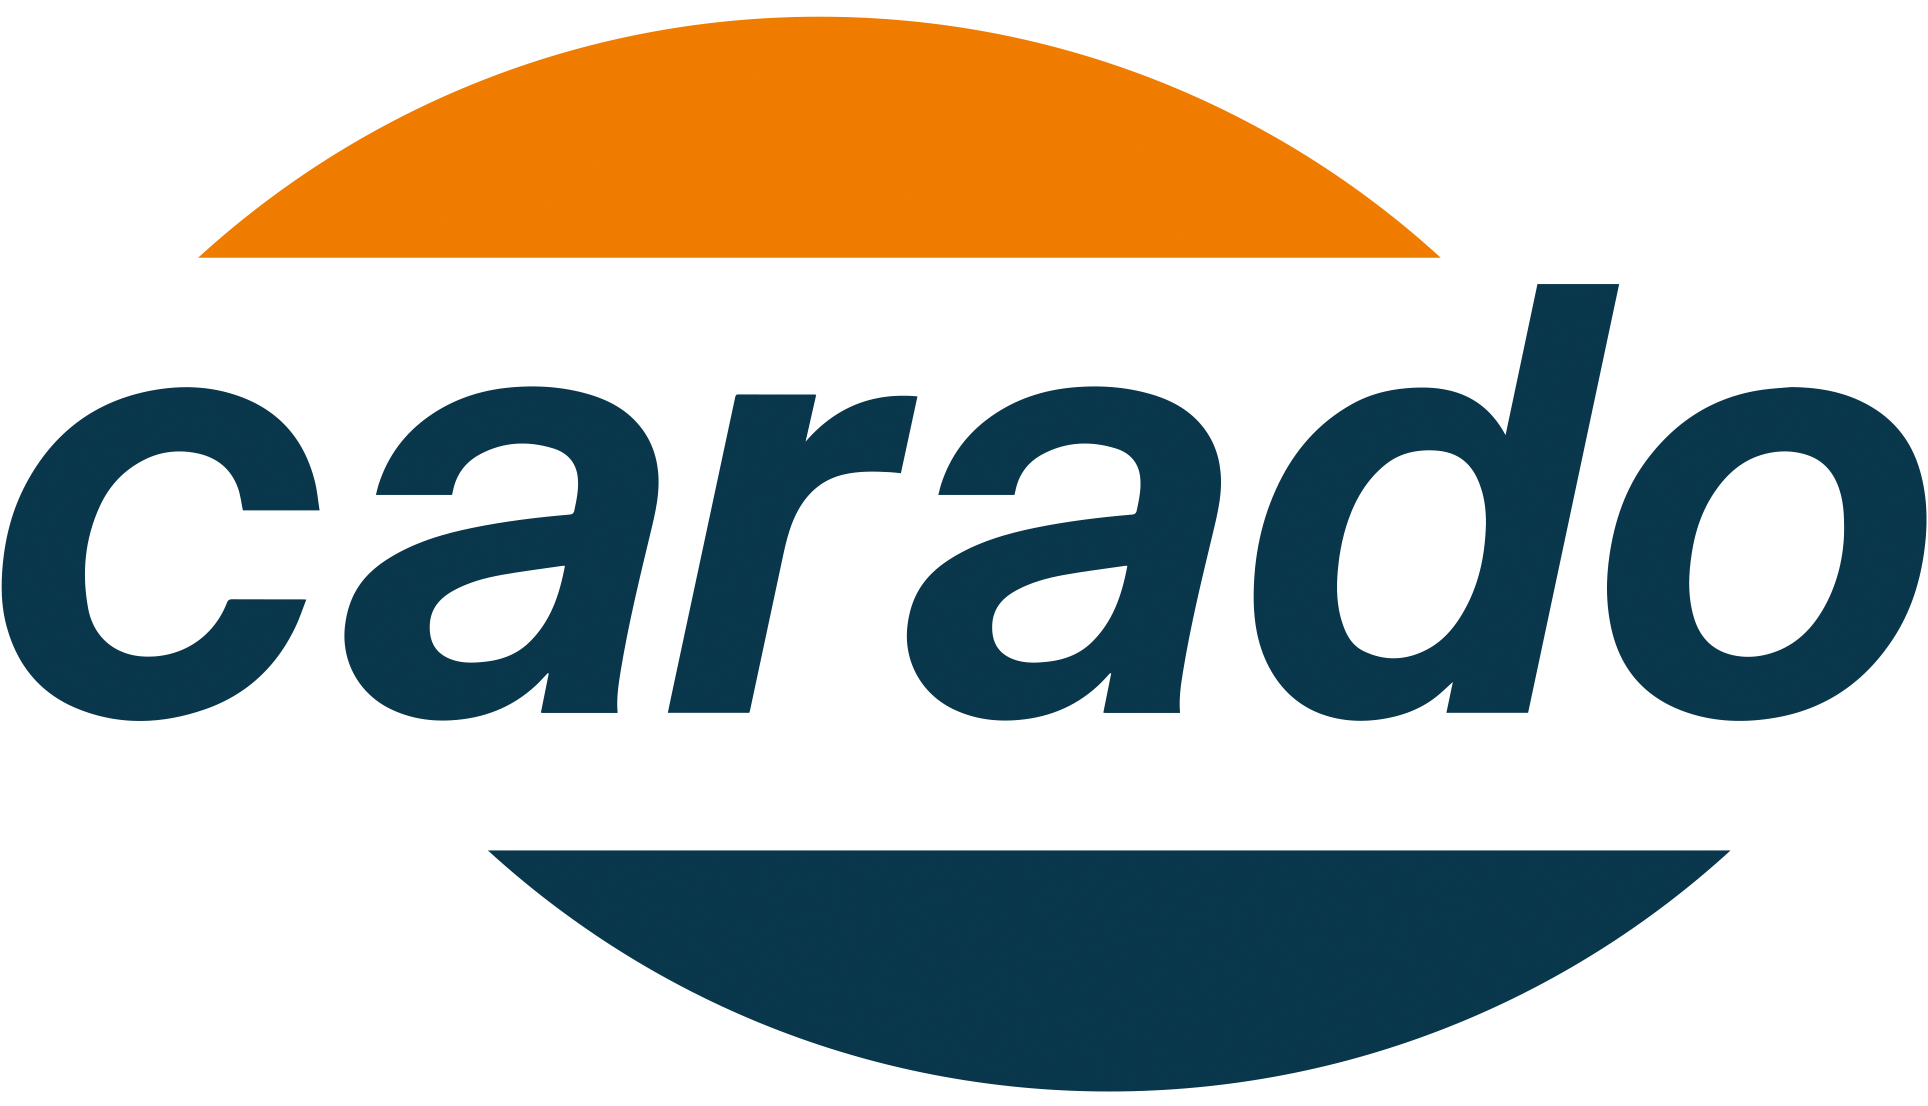 logo_carado_srgb_trans_farbig_croped